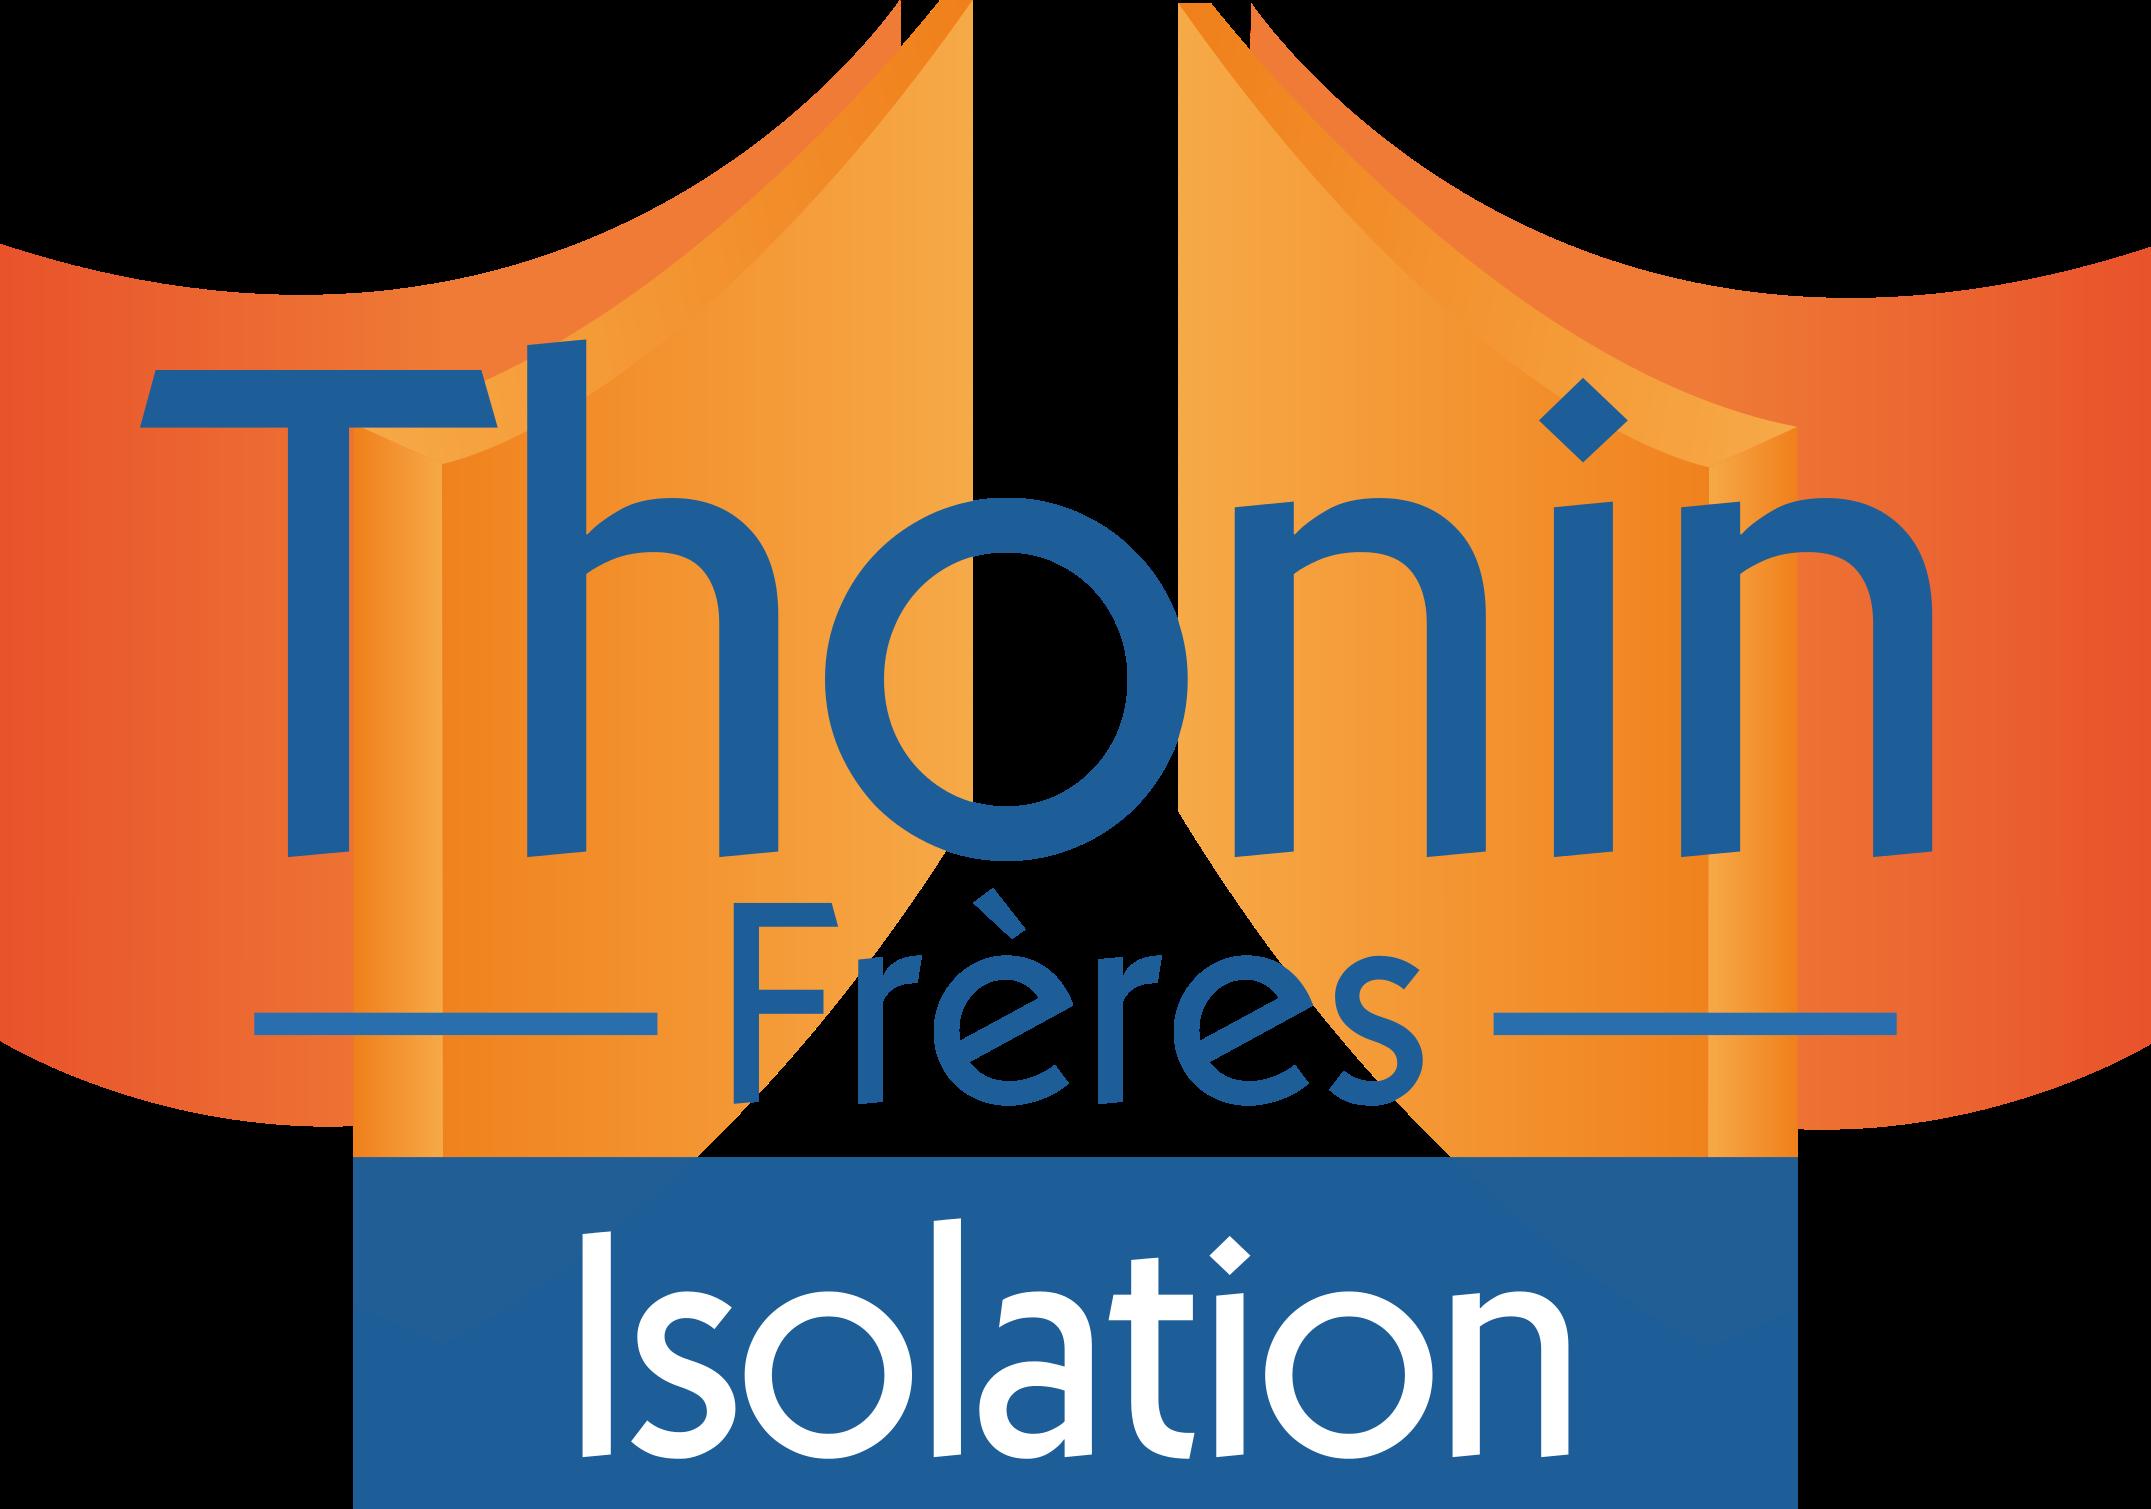 Logo Thonin